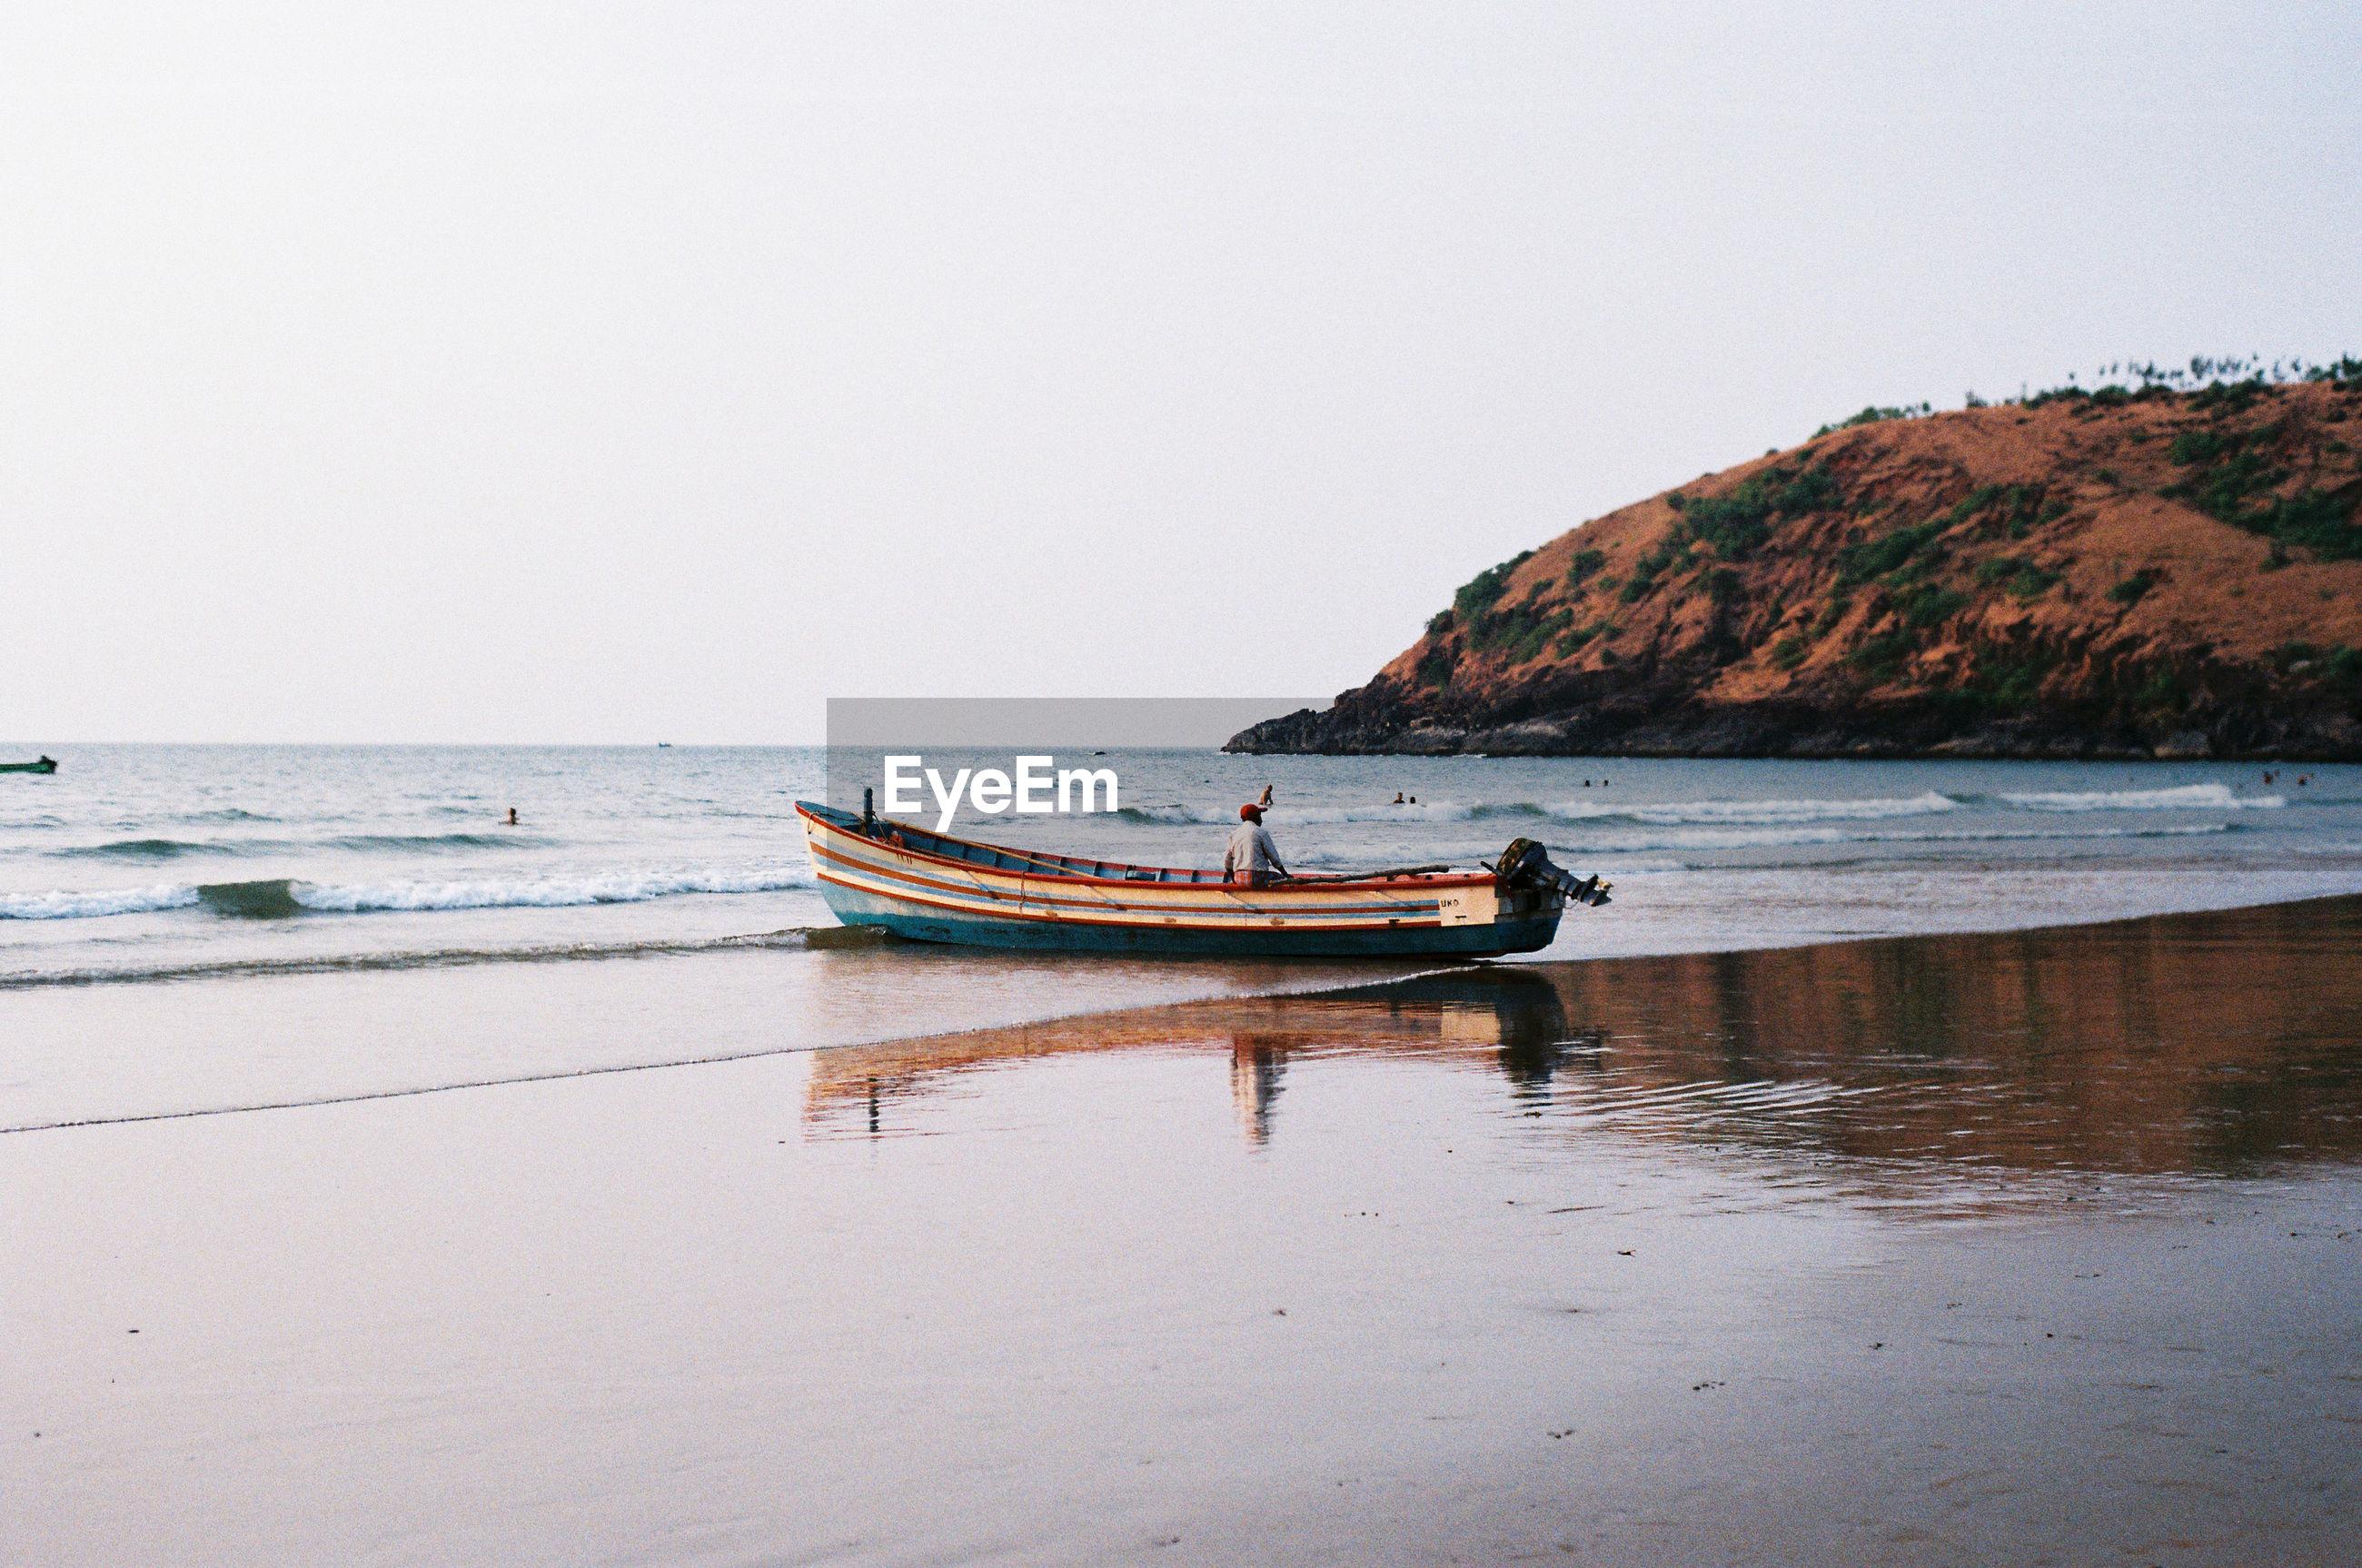 Man sitting in boat on beach